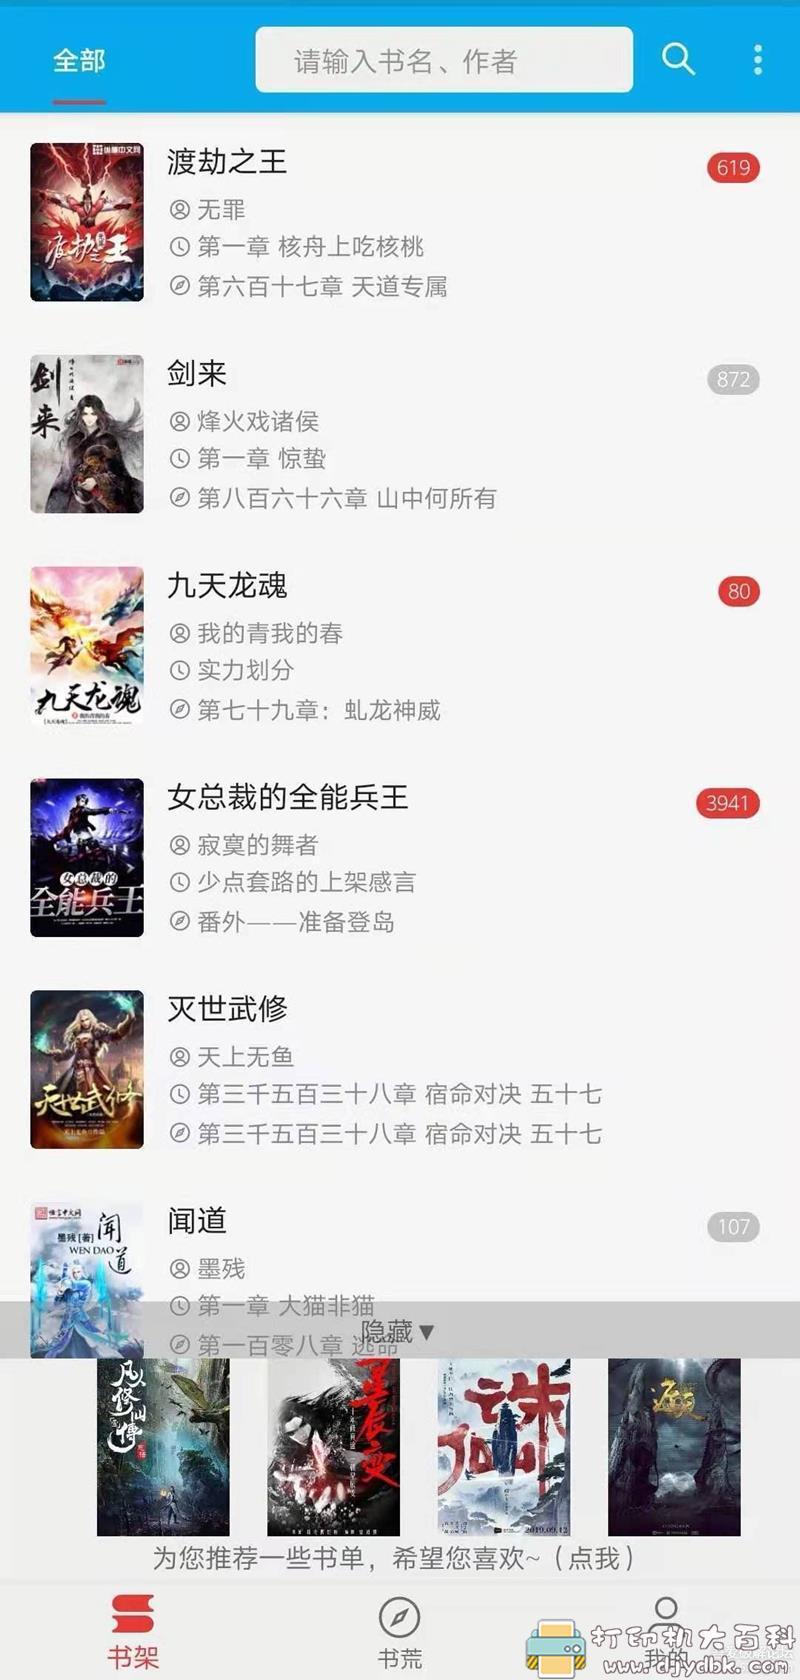 [Android]免费小说软件:爱上看书V1.7 配图 No.1